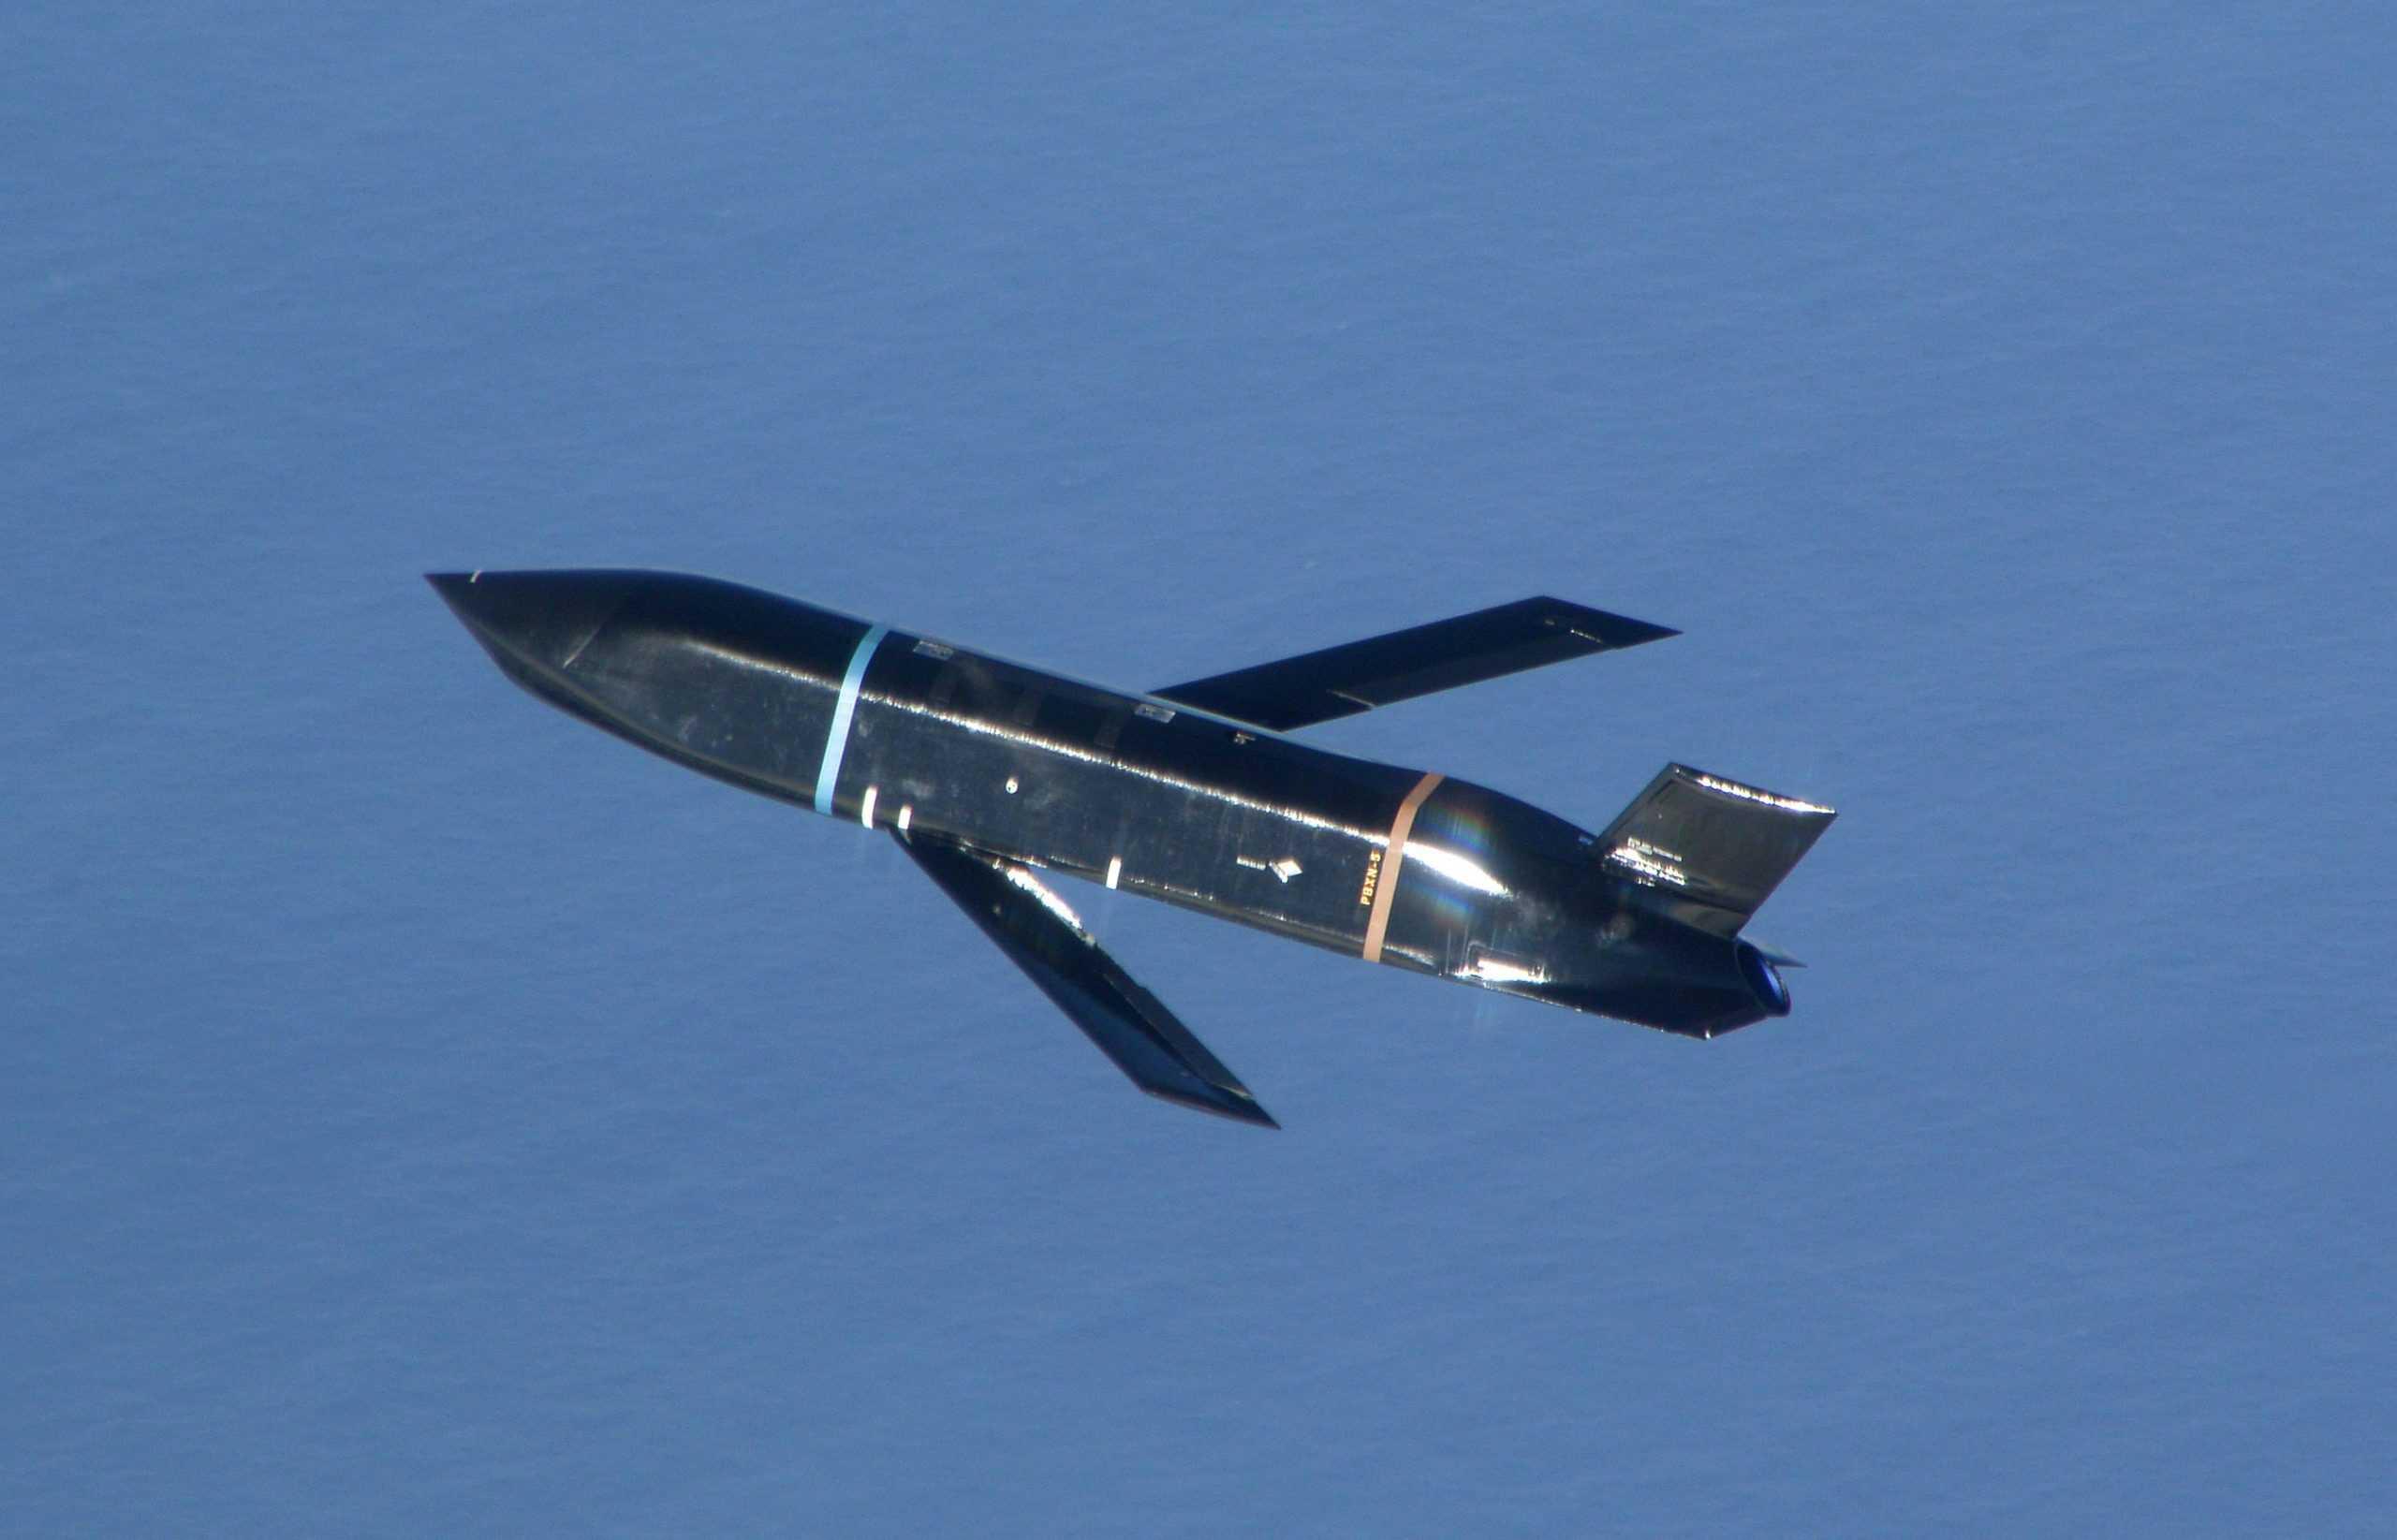 Протикорабельна ракета AGM-158C LRASM (Long Range Anti-Ship Missile) у польоті